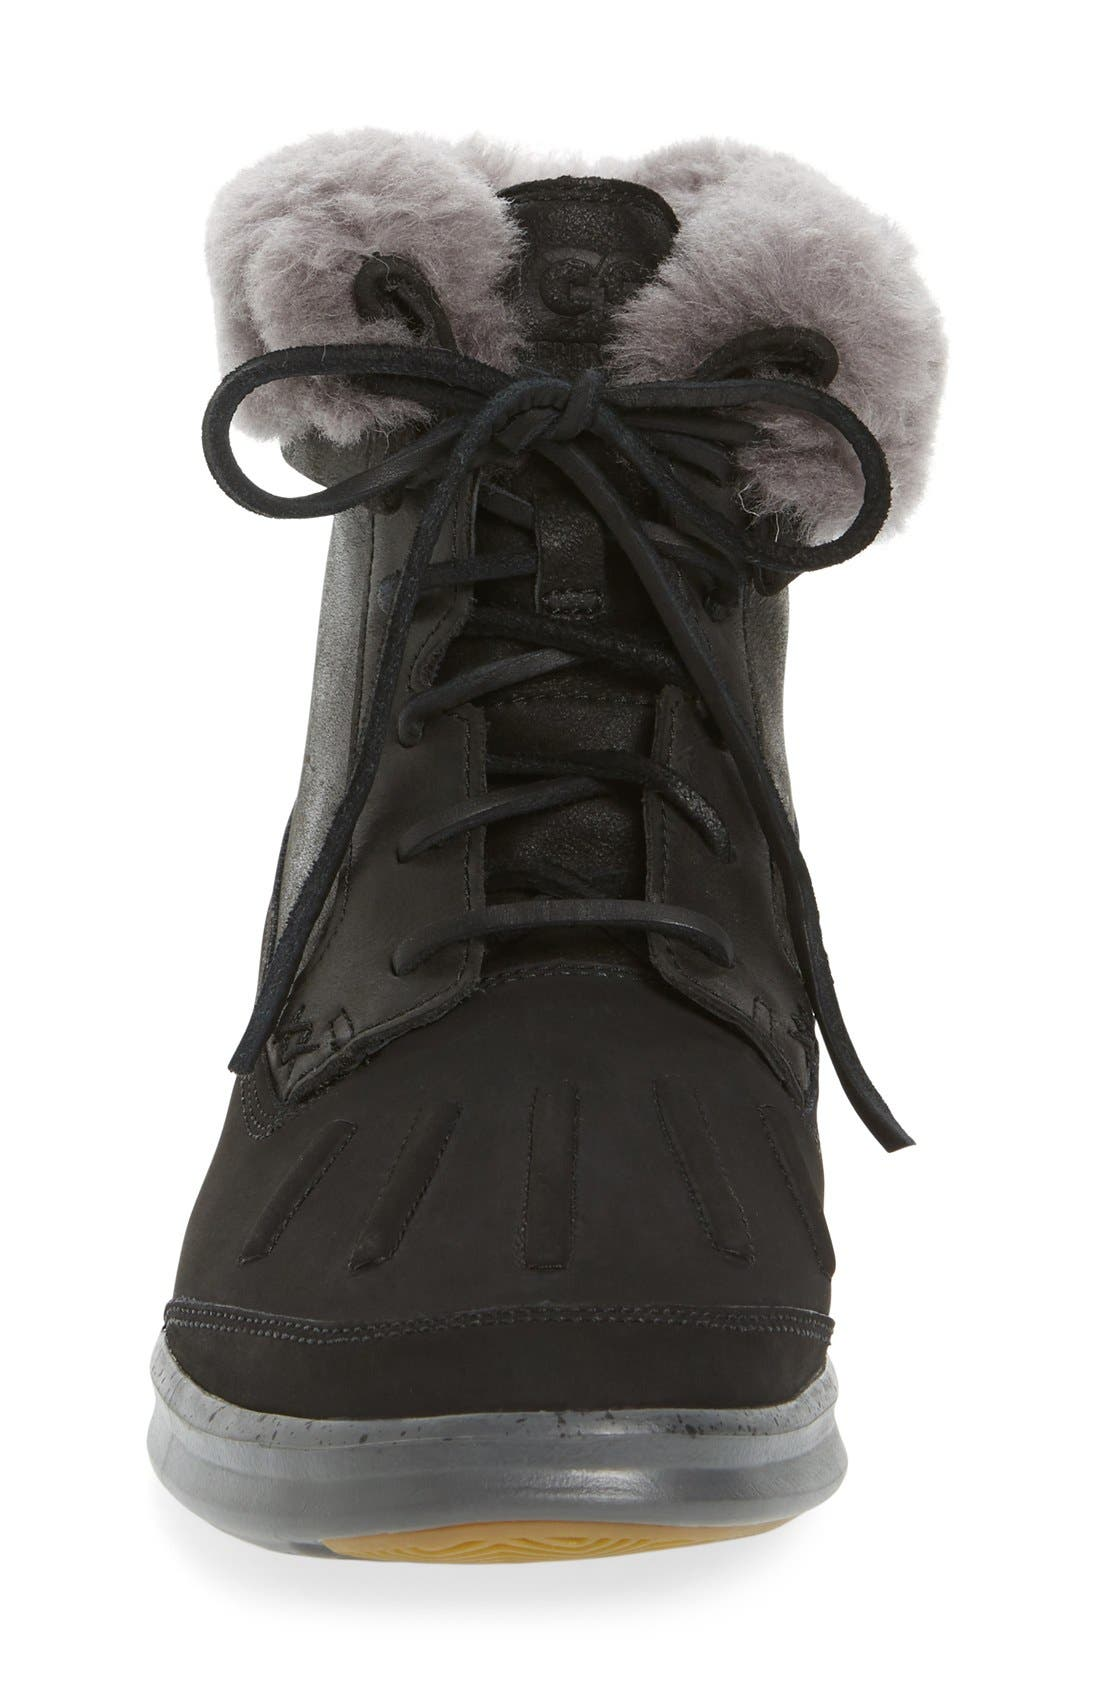 Roskoe Snow Boot,                             Alternate thumbnail 2, color,                             001